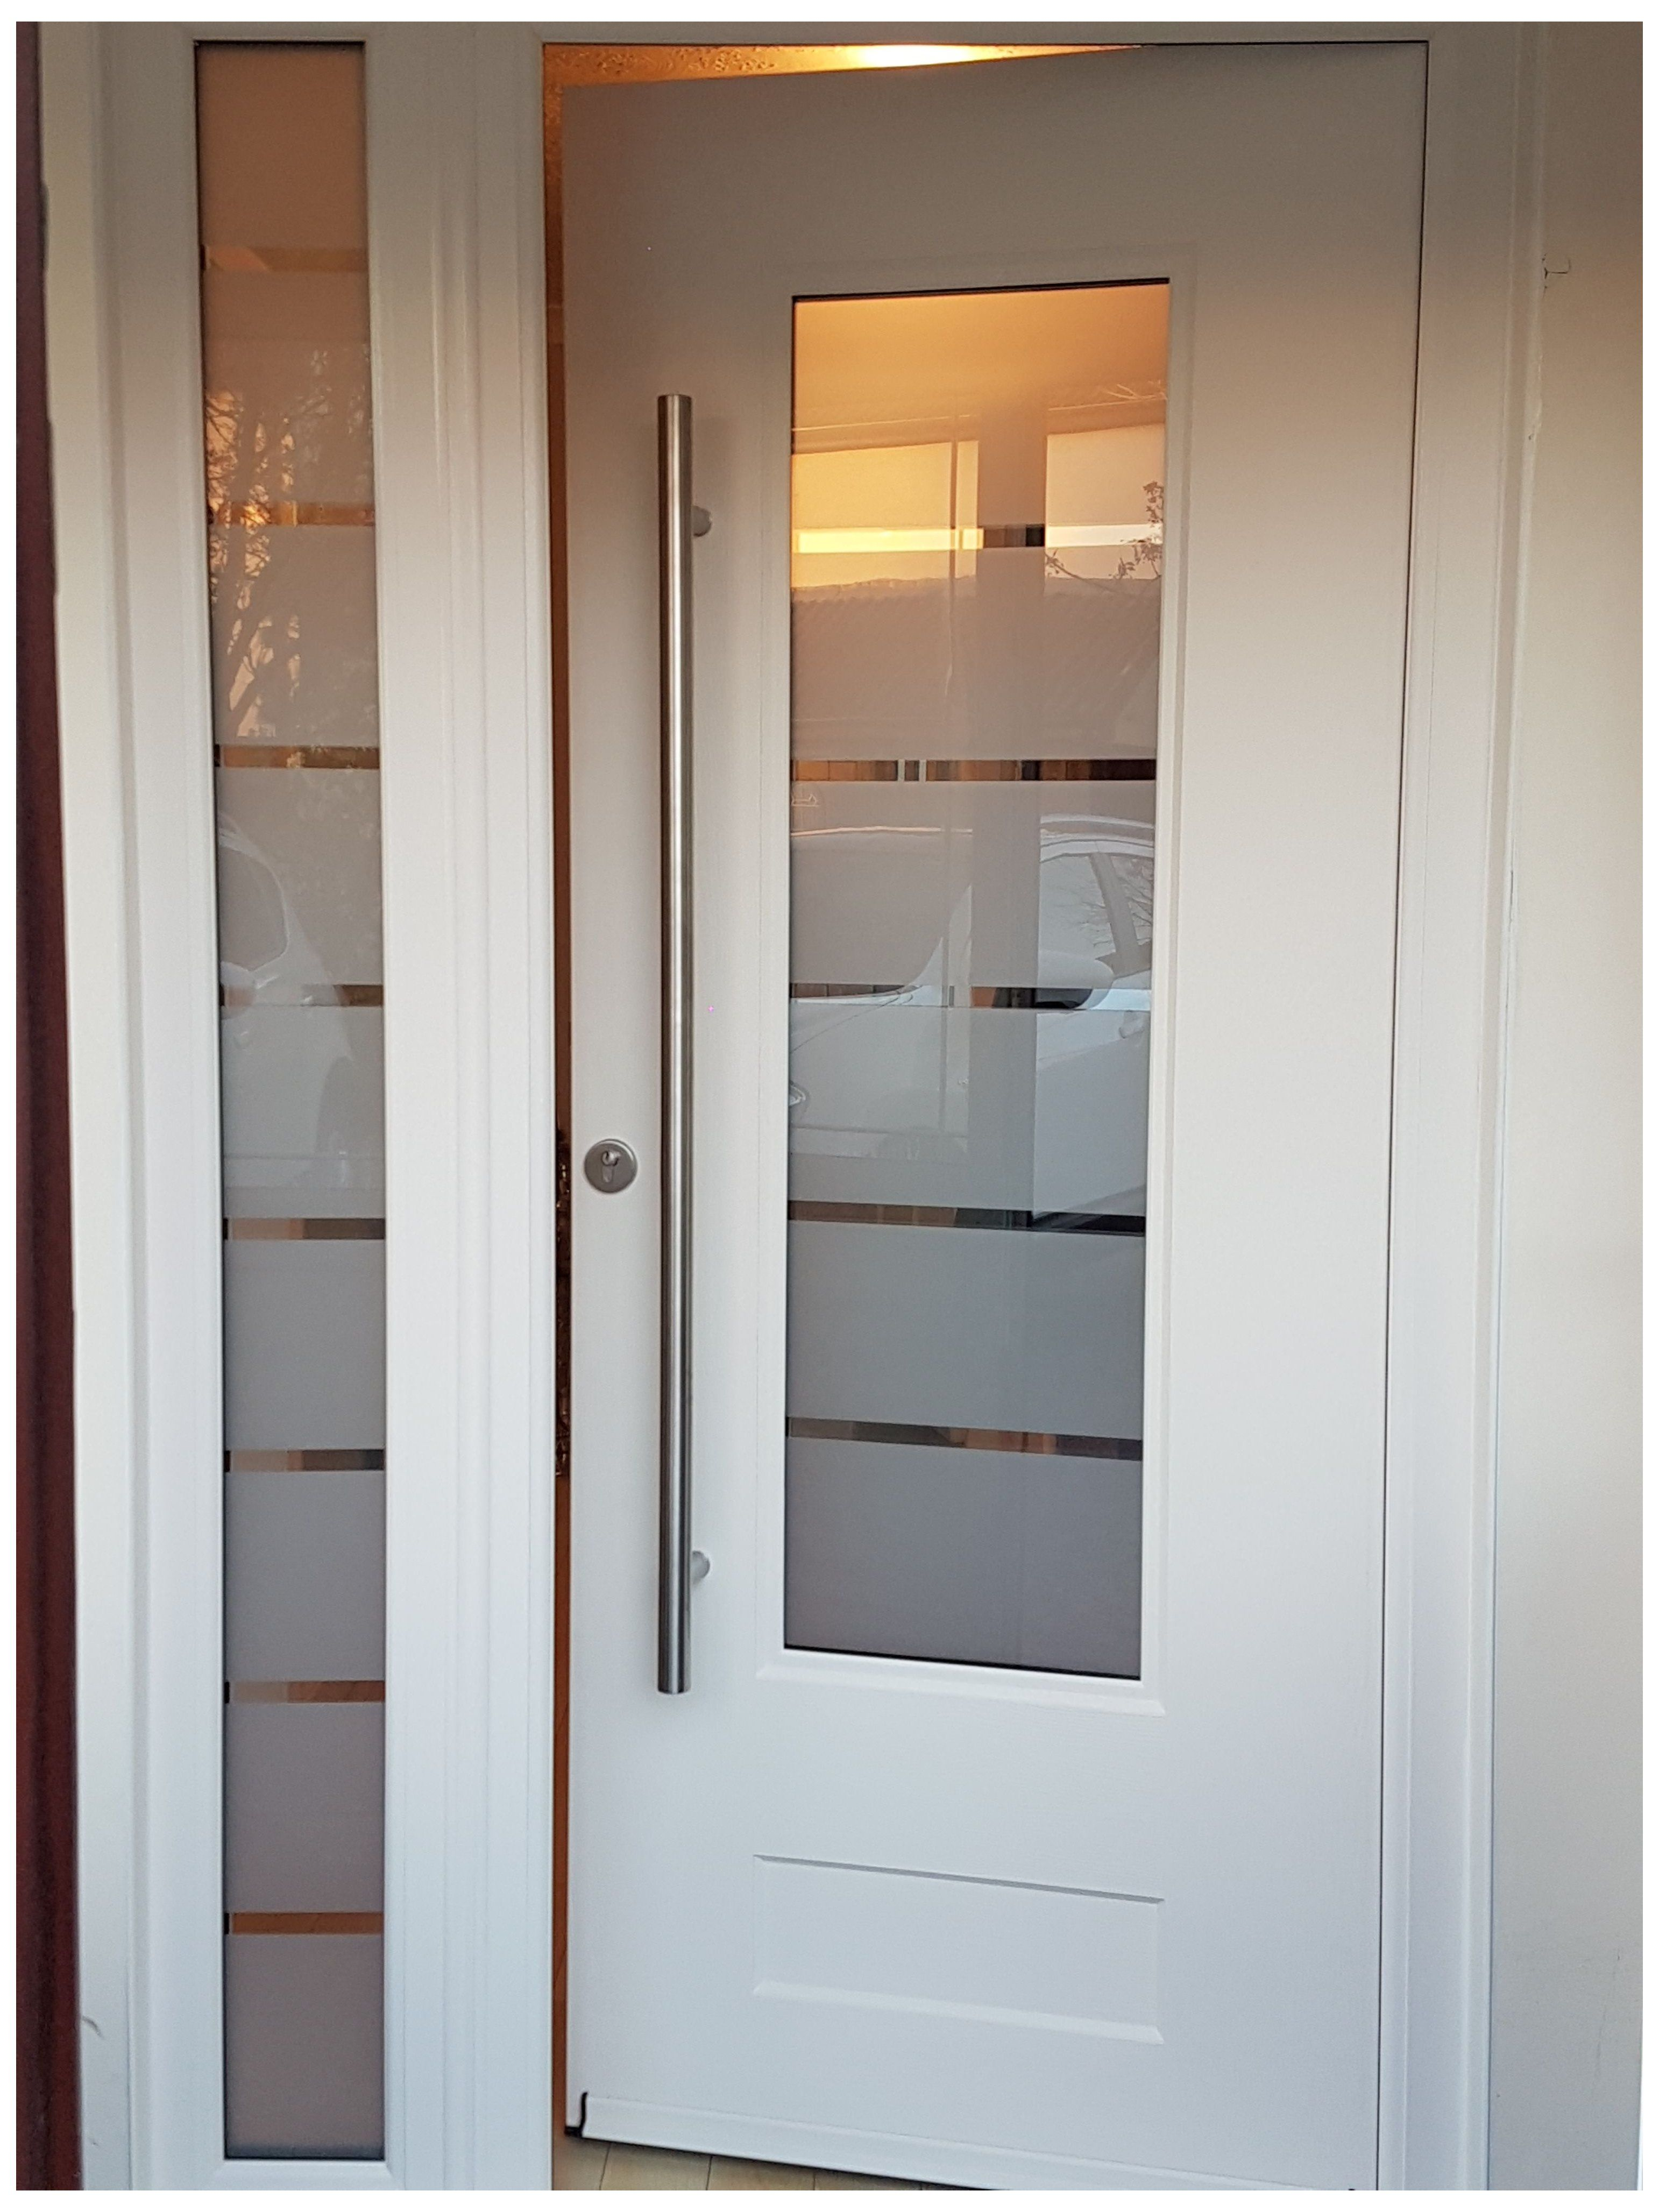 Industry Leading Manufacturer Of Tailor Made Composite Doors White Glass Front Door A Beauti In 2020 Contemporary Front Doors Front Doors Uk Sliding Doors Interior